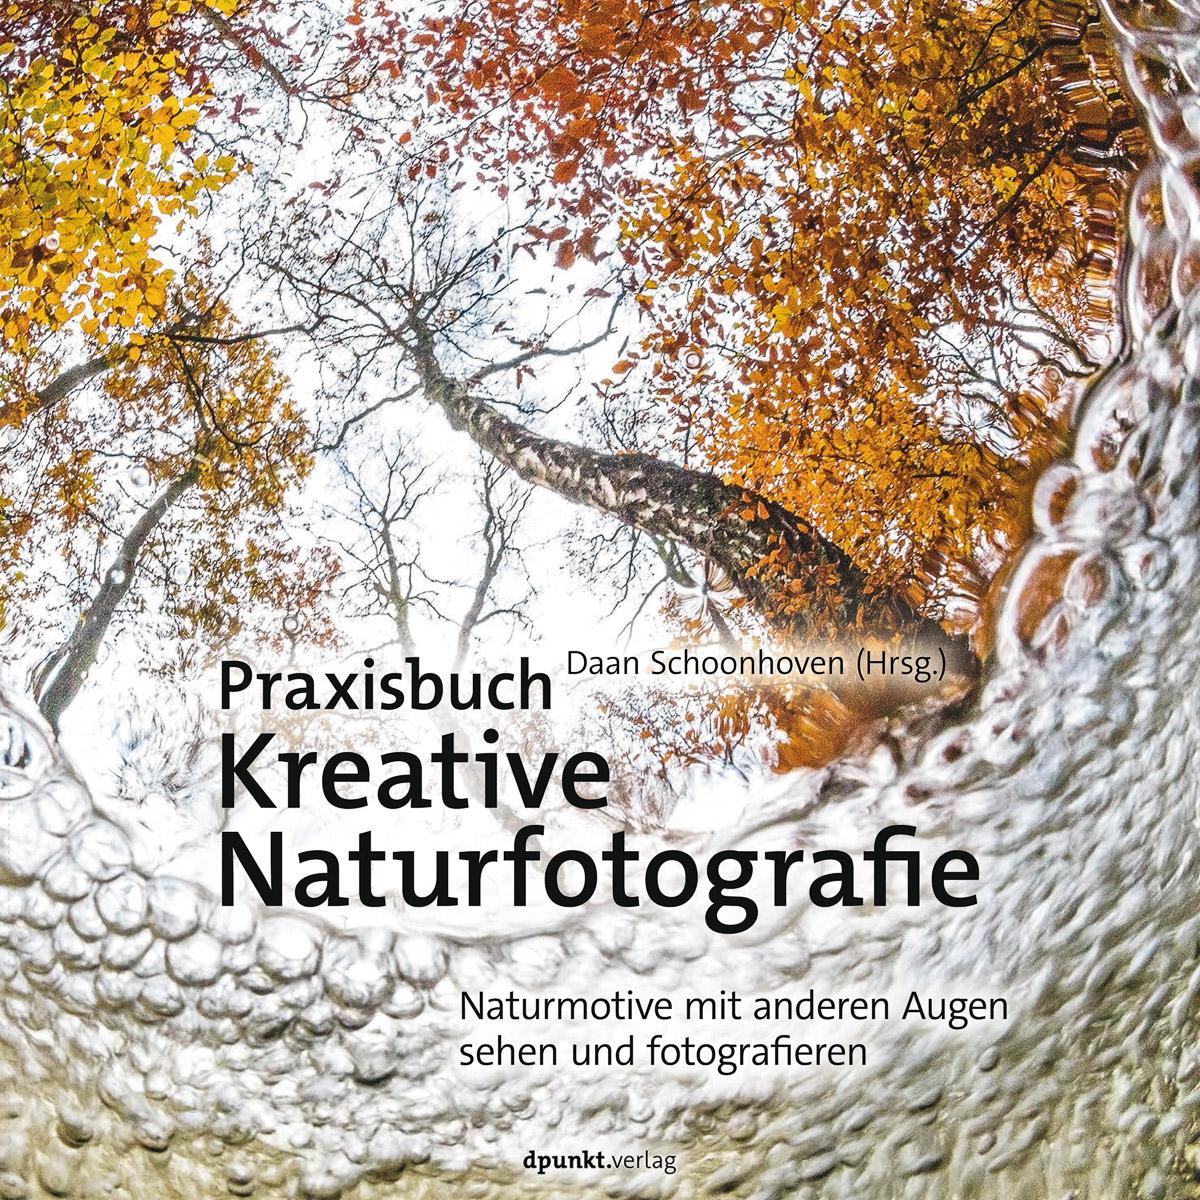 Praxisbuch Krative Naturfotografie